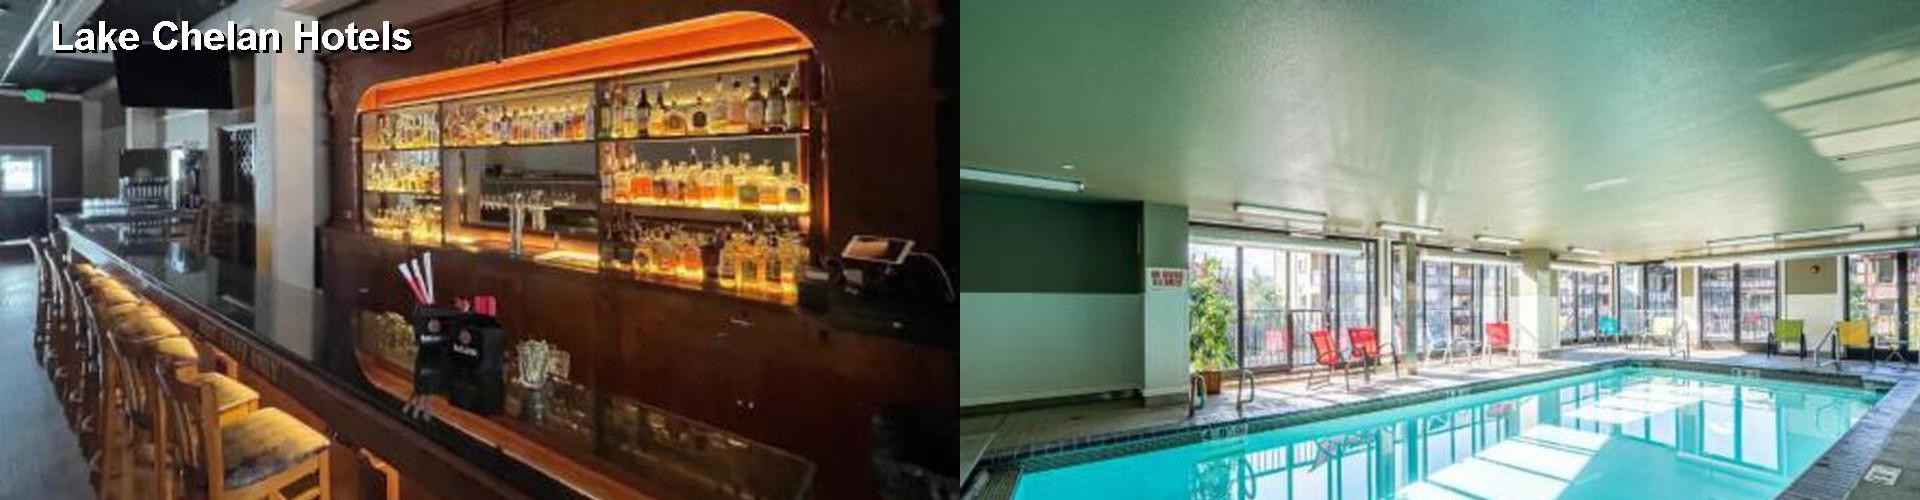 2 Best Hotels Near Lake Chelan